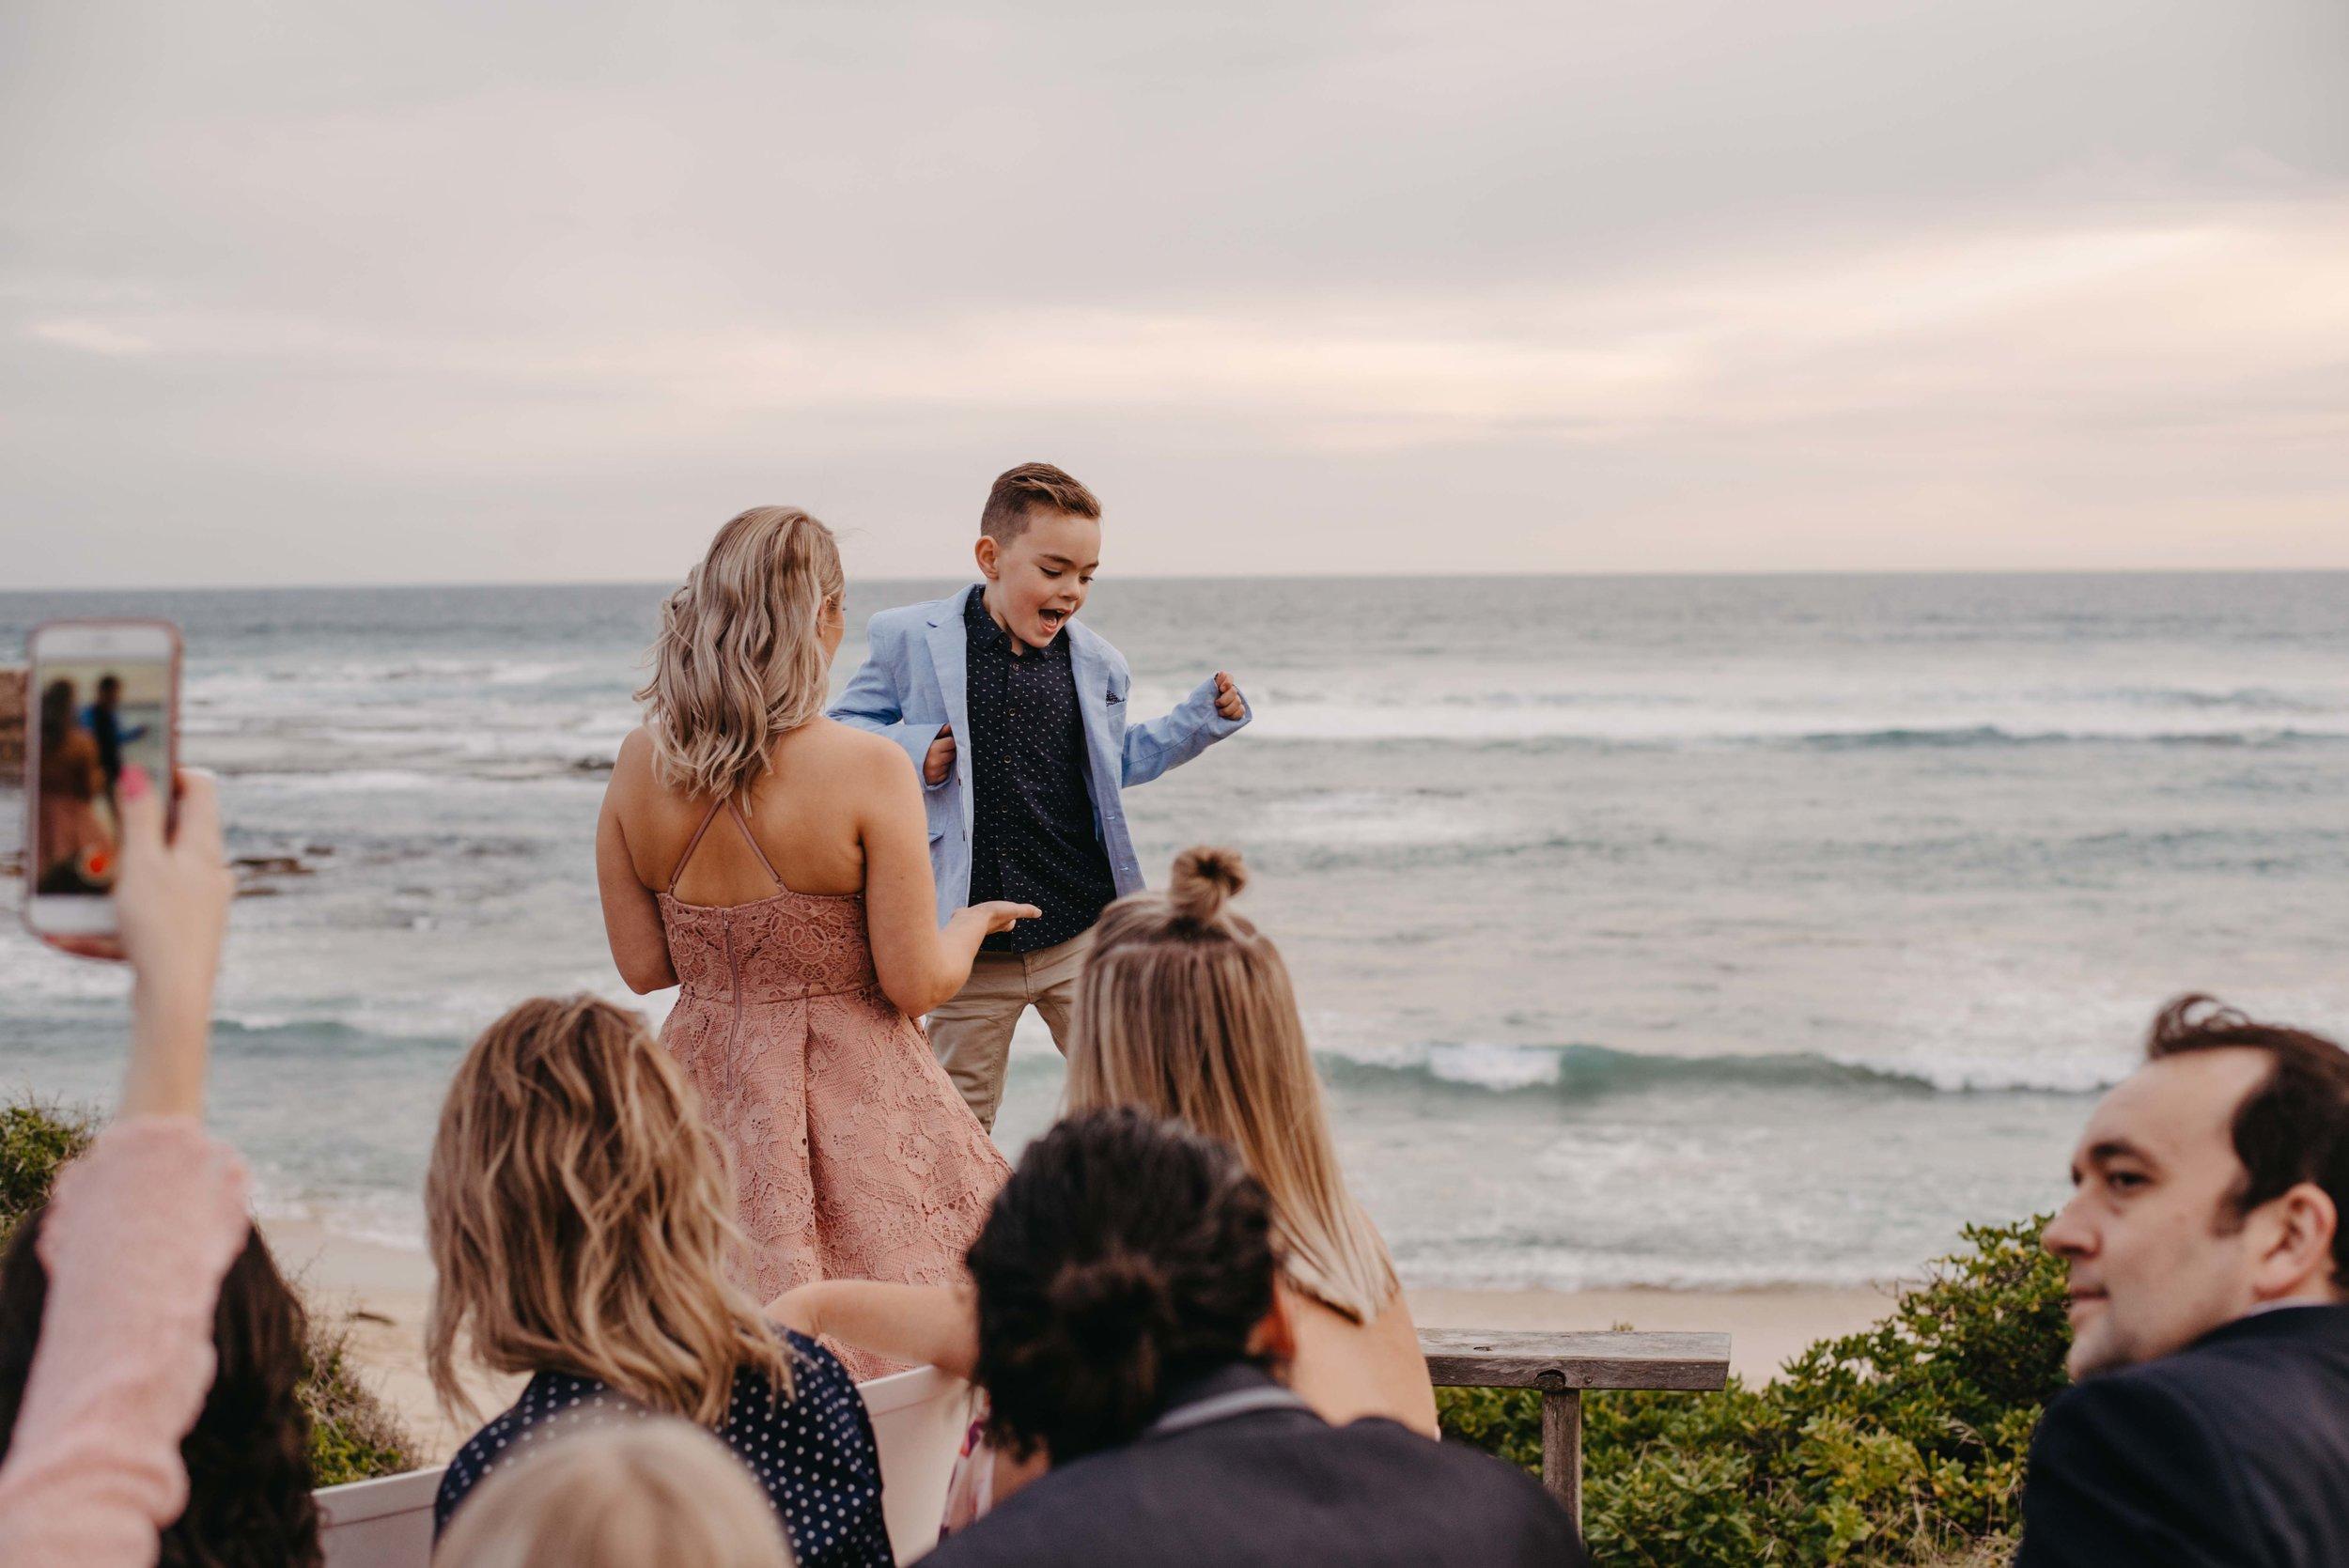 All-Smiles-Sorrento-Wedding-photography-sorrento-wedding-marissa-jade-photography-61.jpg